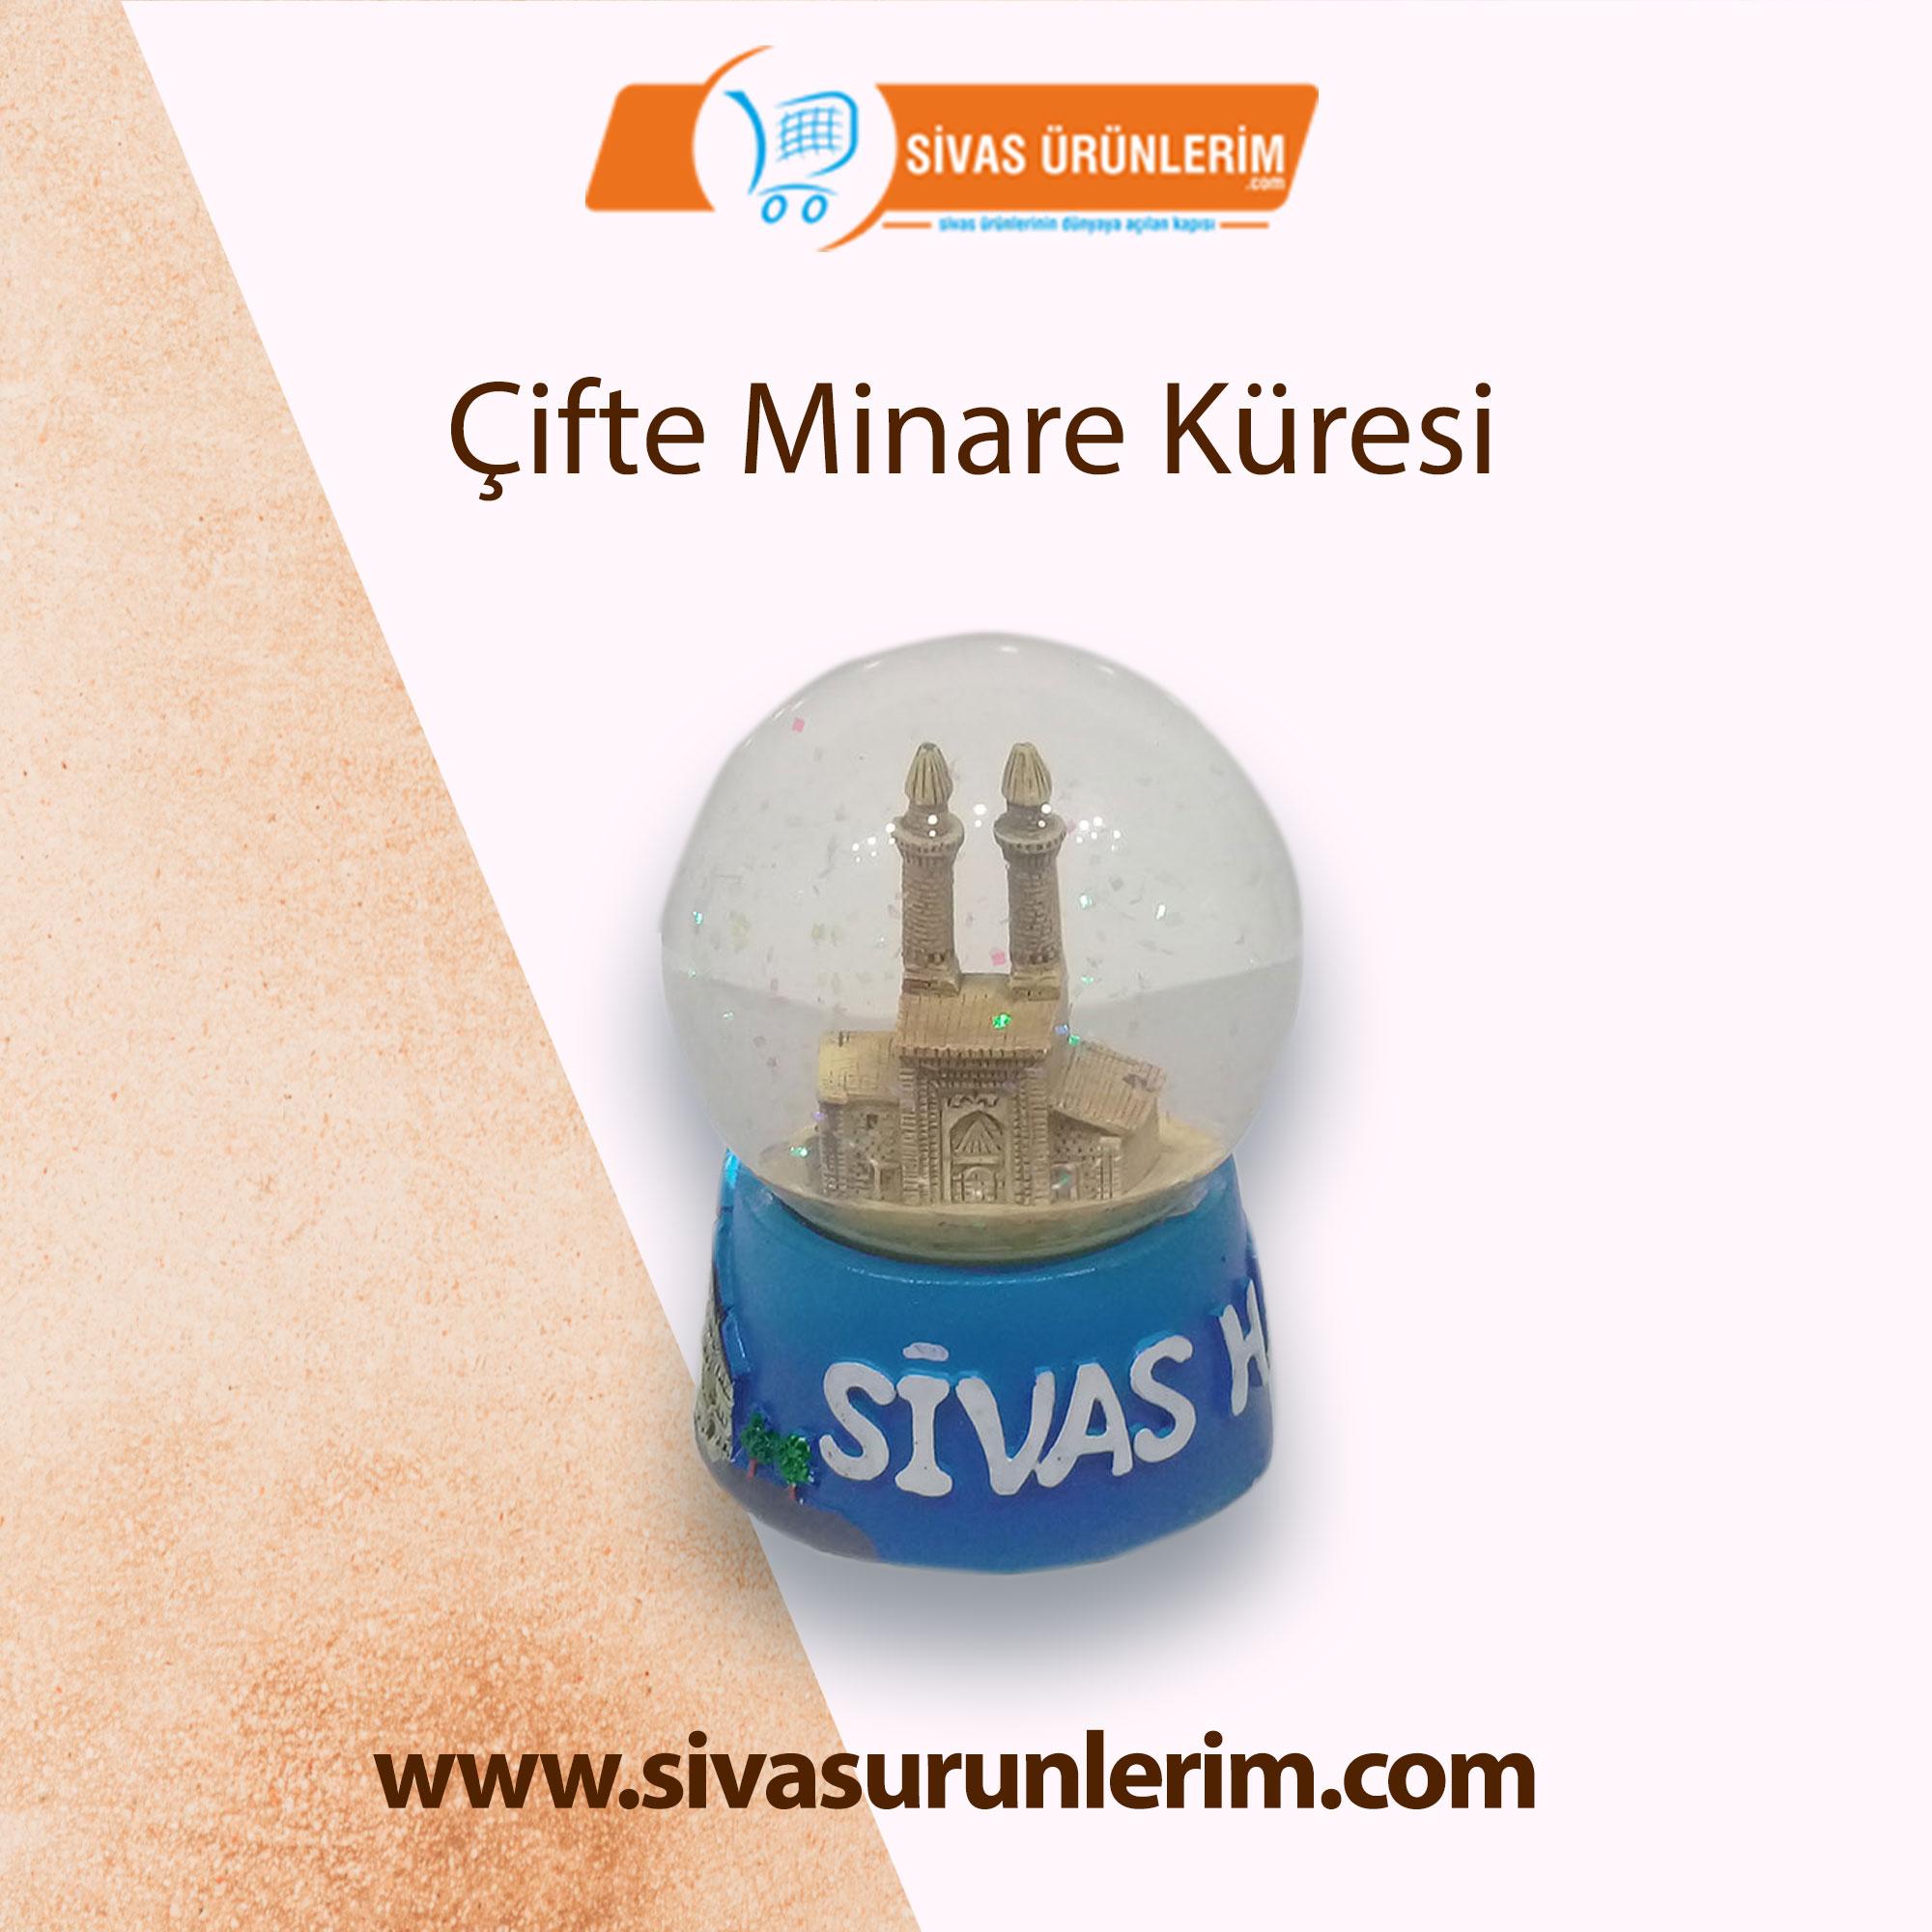 Çifte Minare Küresi